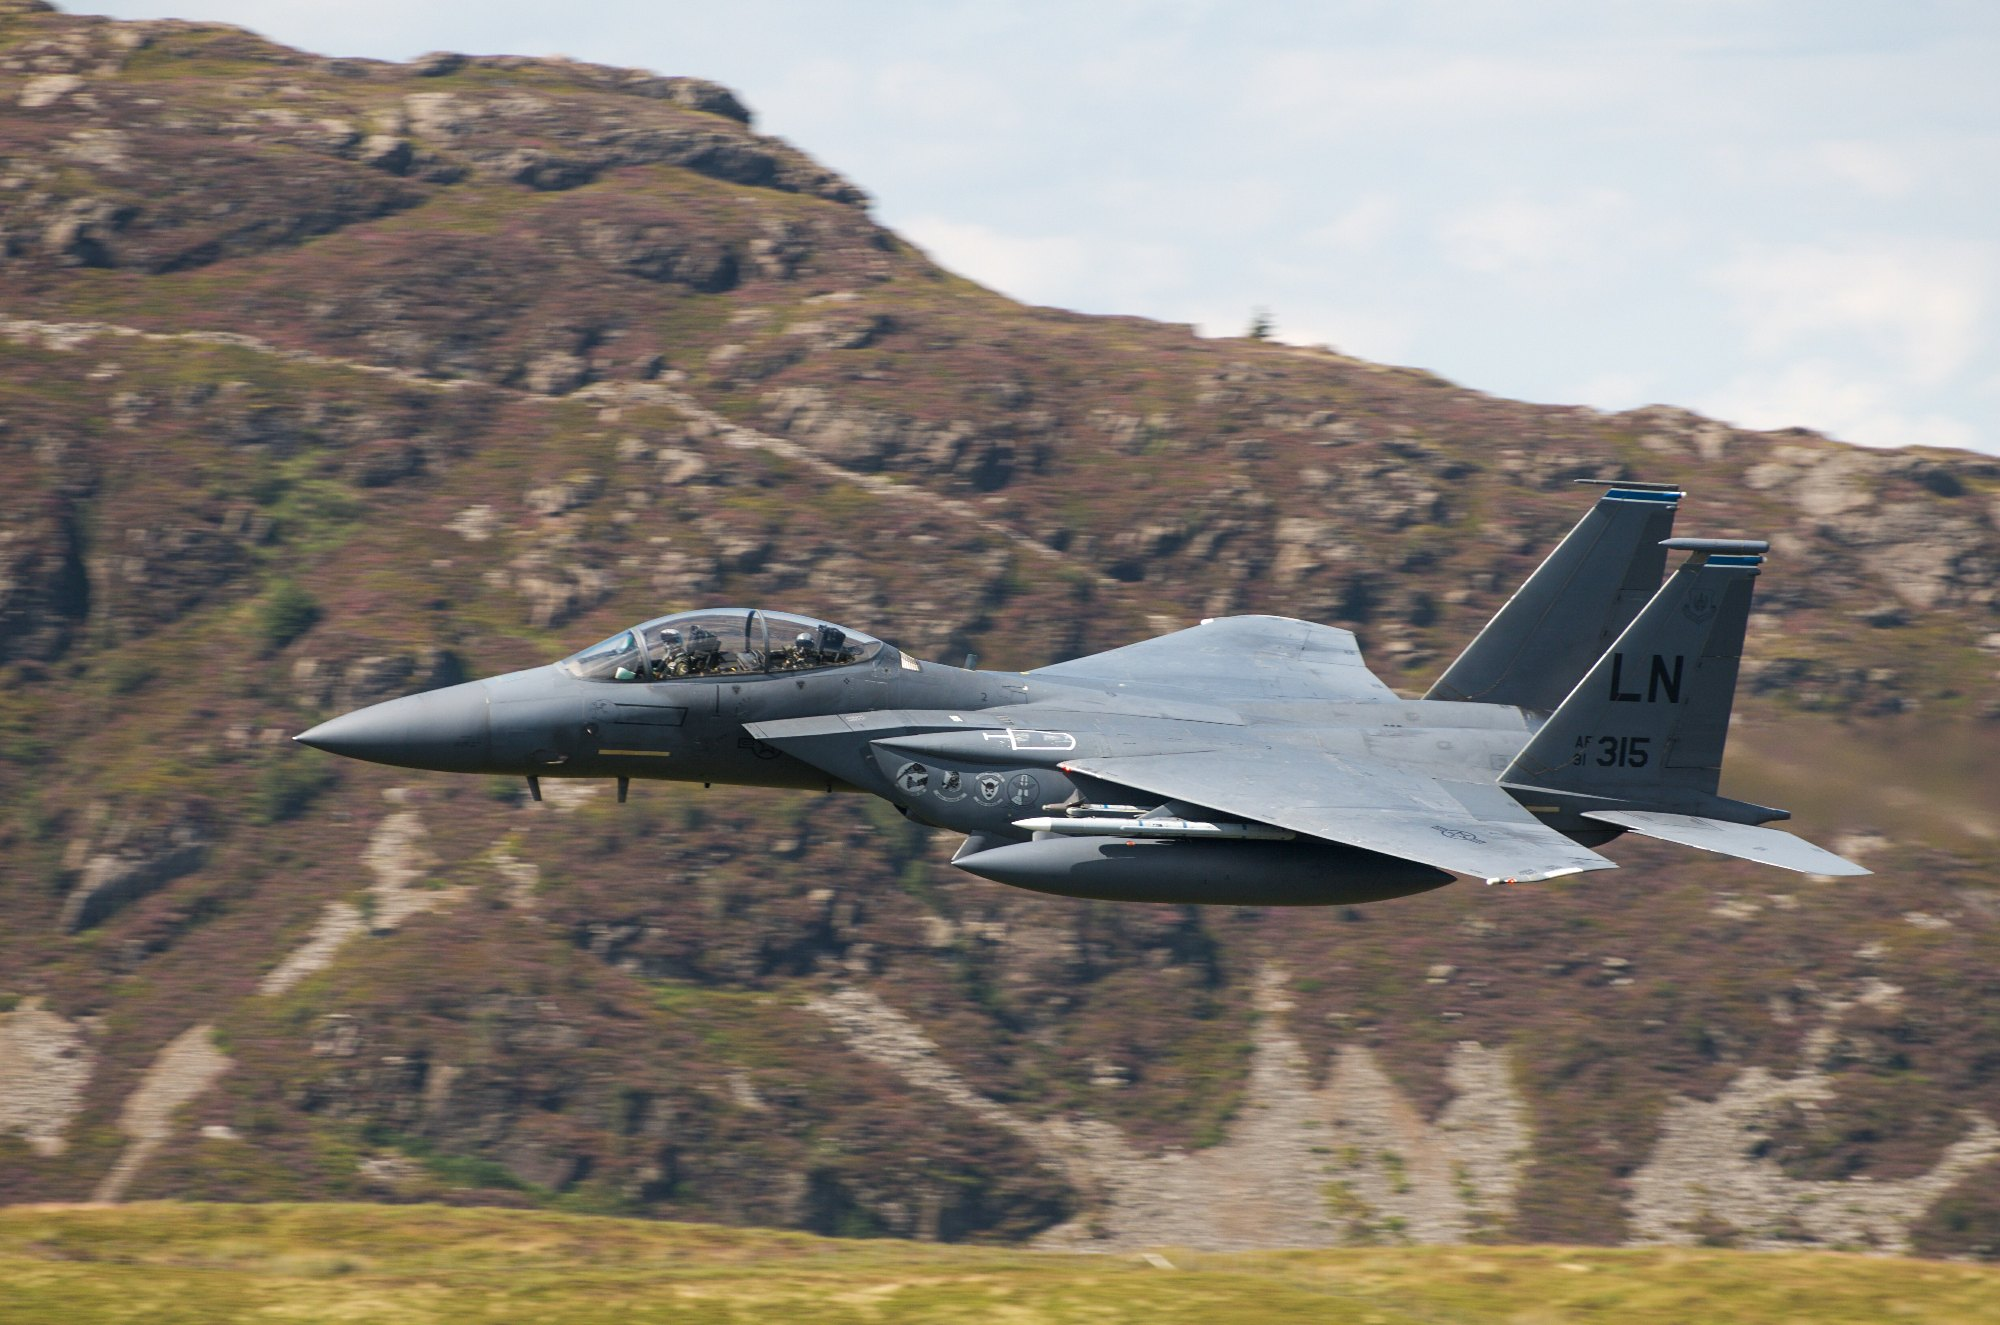 F15 in the Mach Loop, Snowdonia